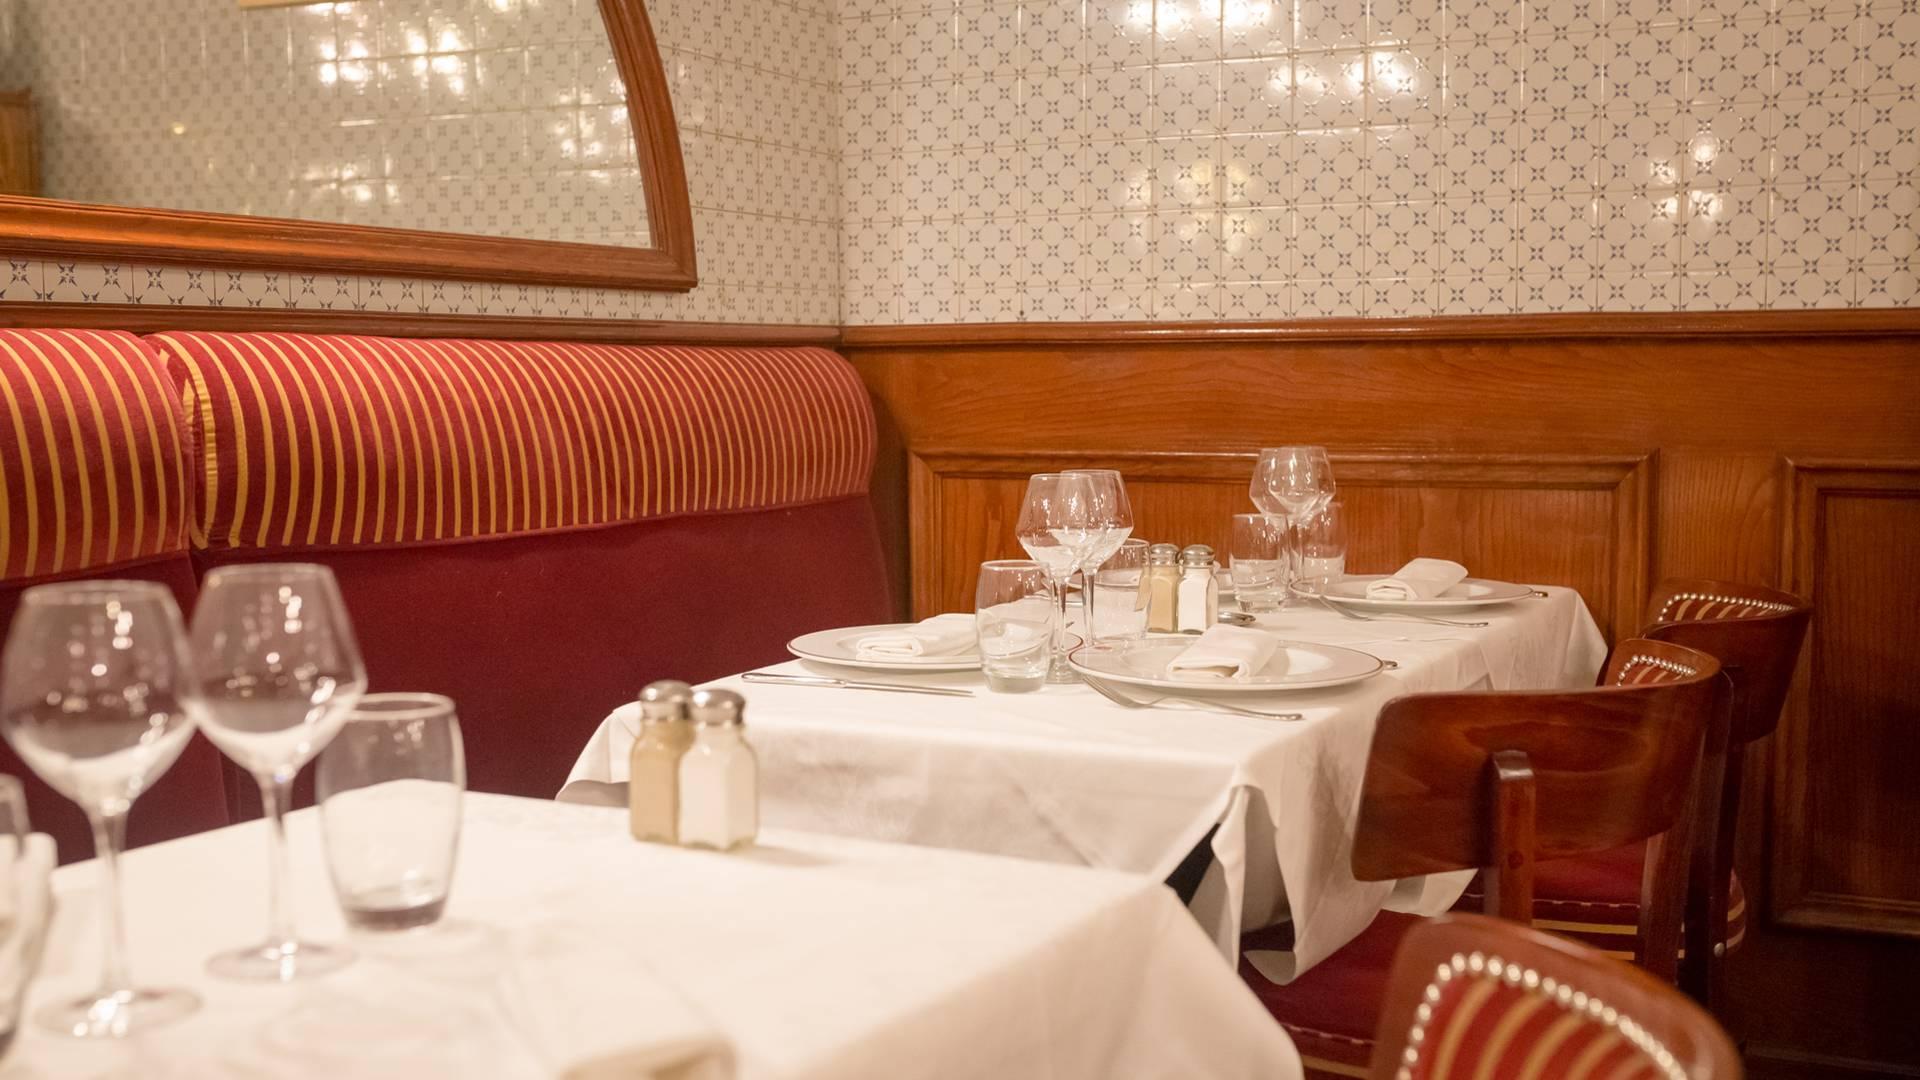 Valenciennes, restaurant l'Escargot, la salle